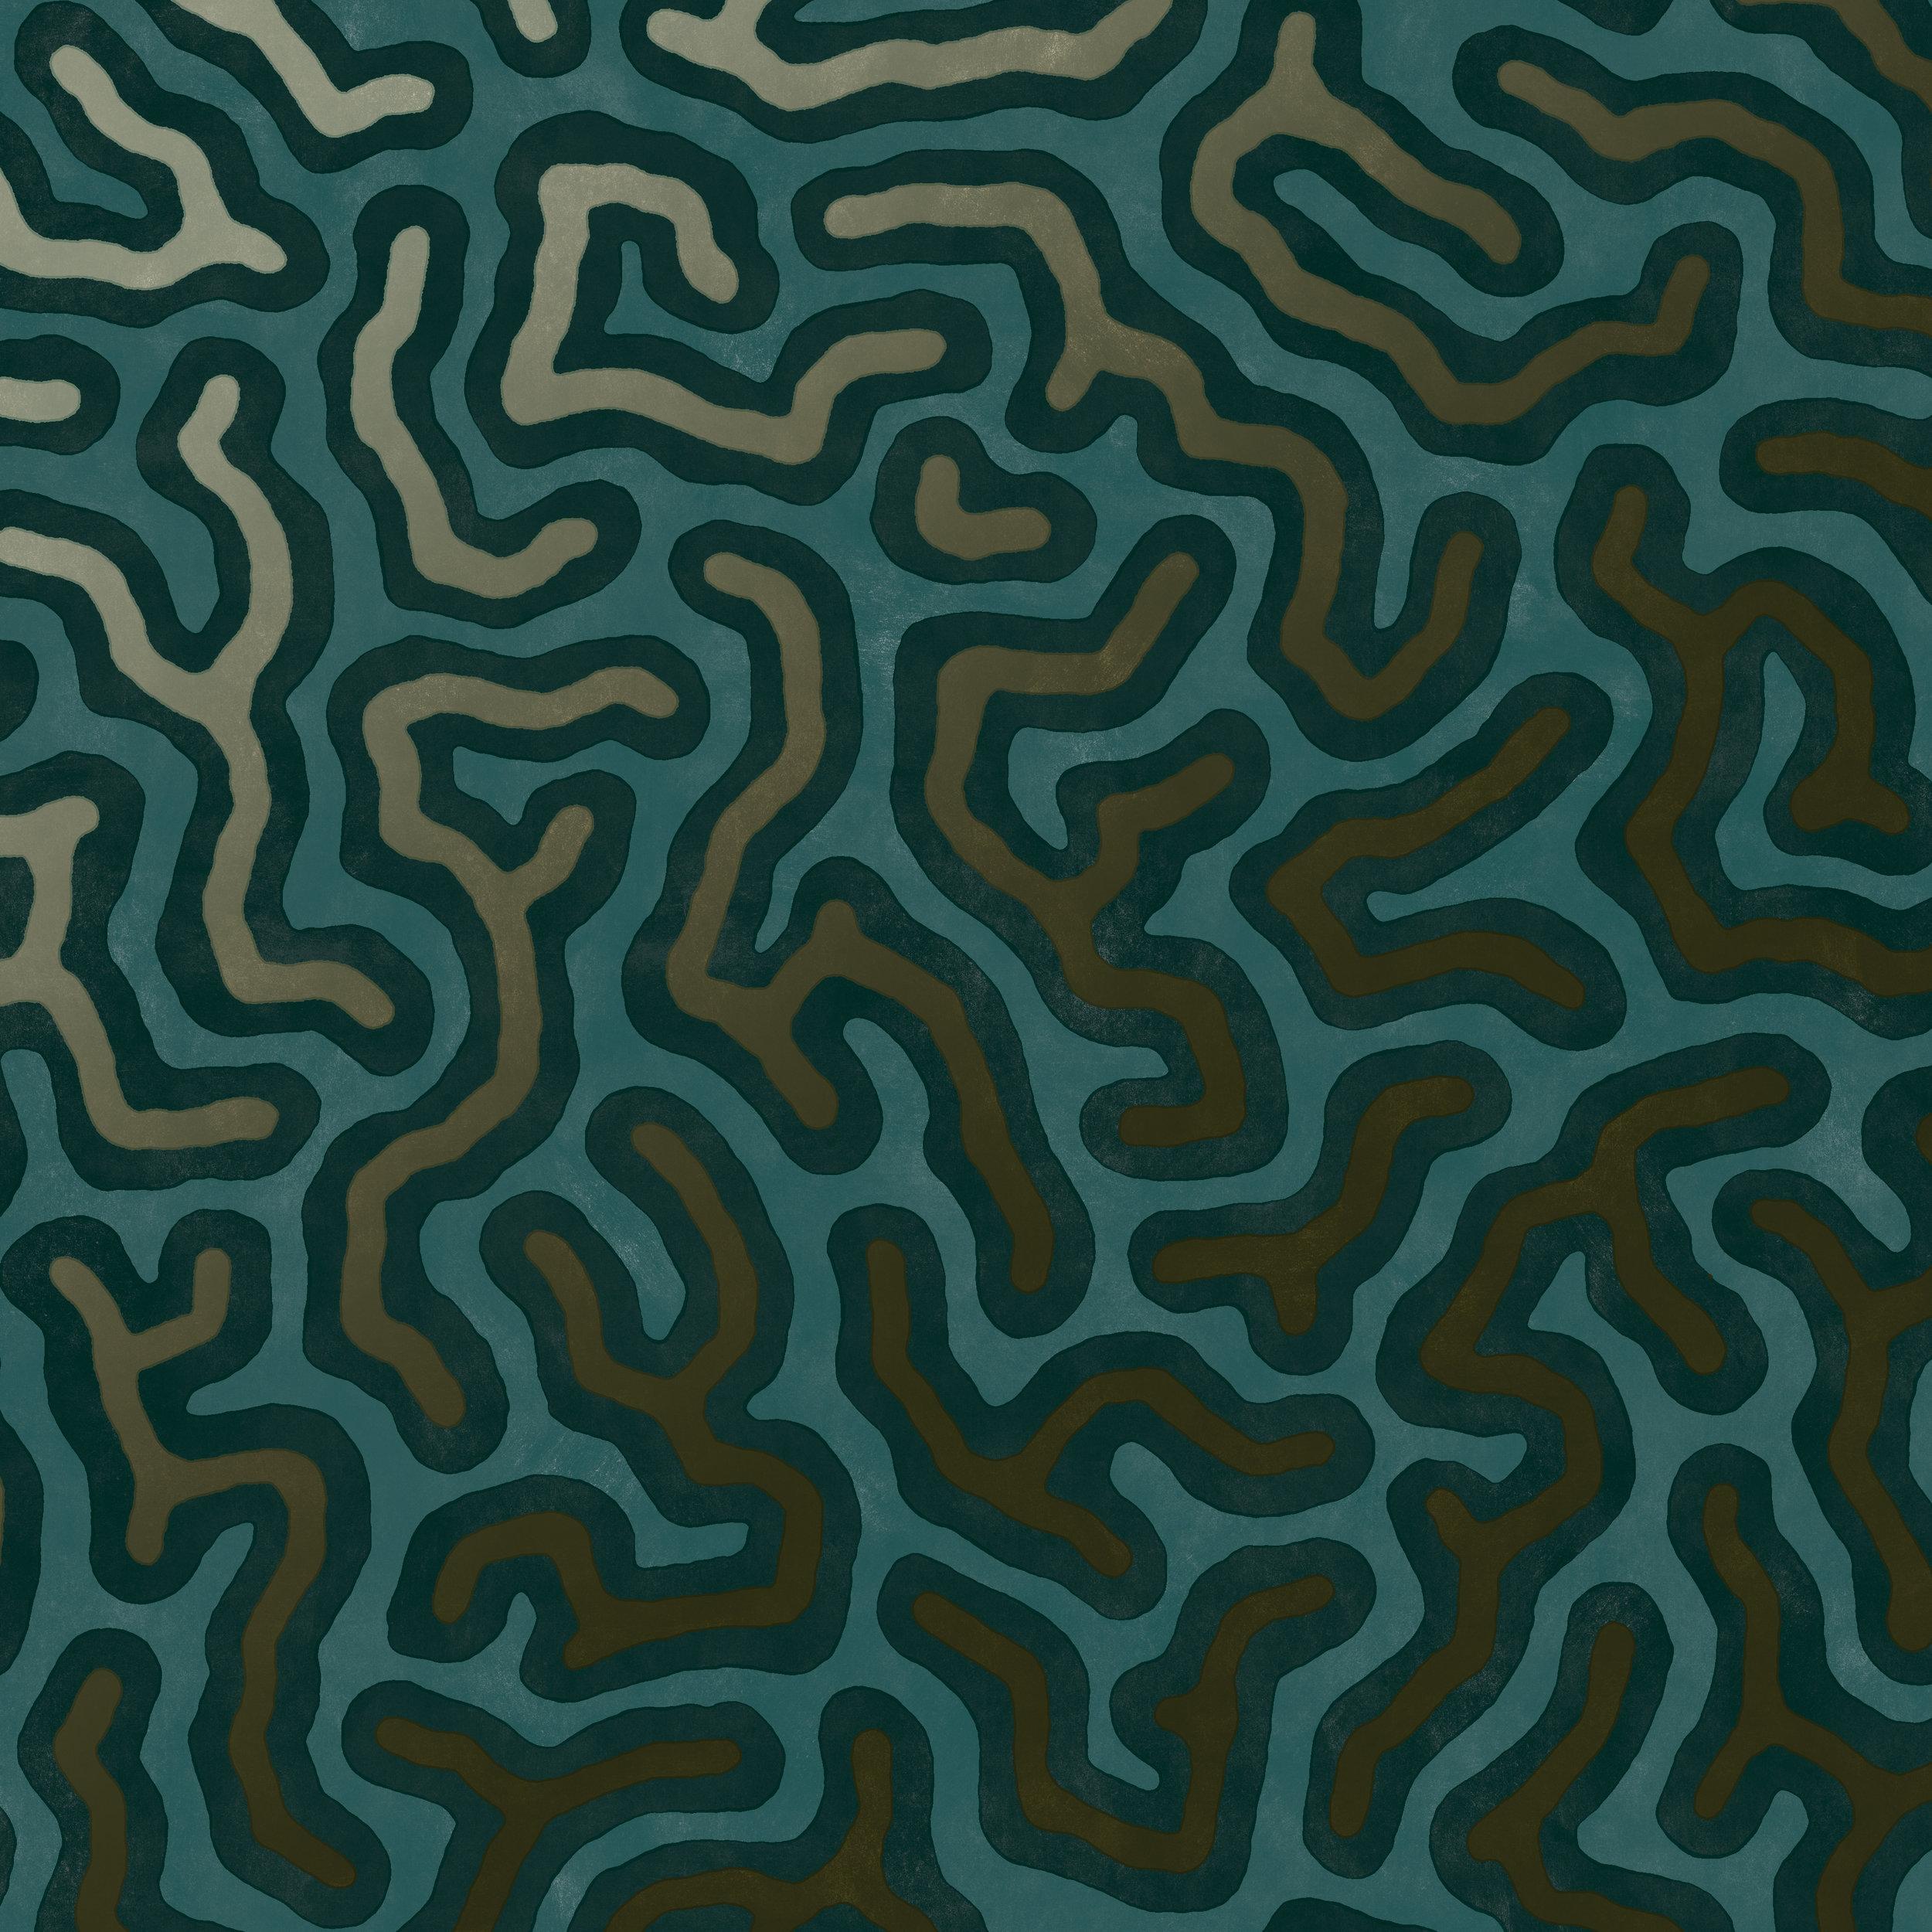 Atoll_Colorway12_DETAIL_WEB.jpg